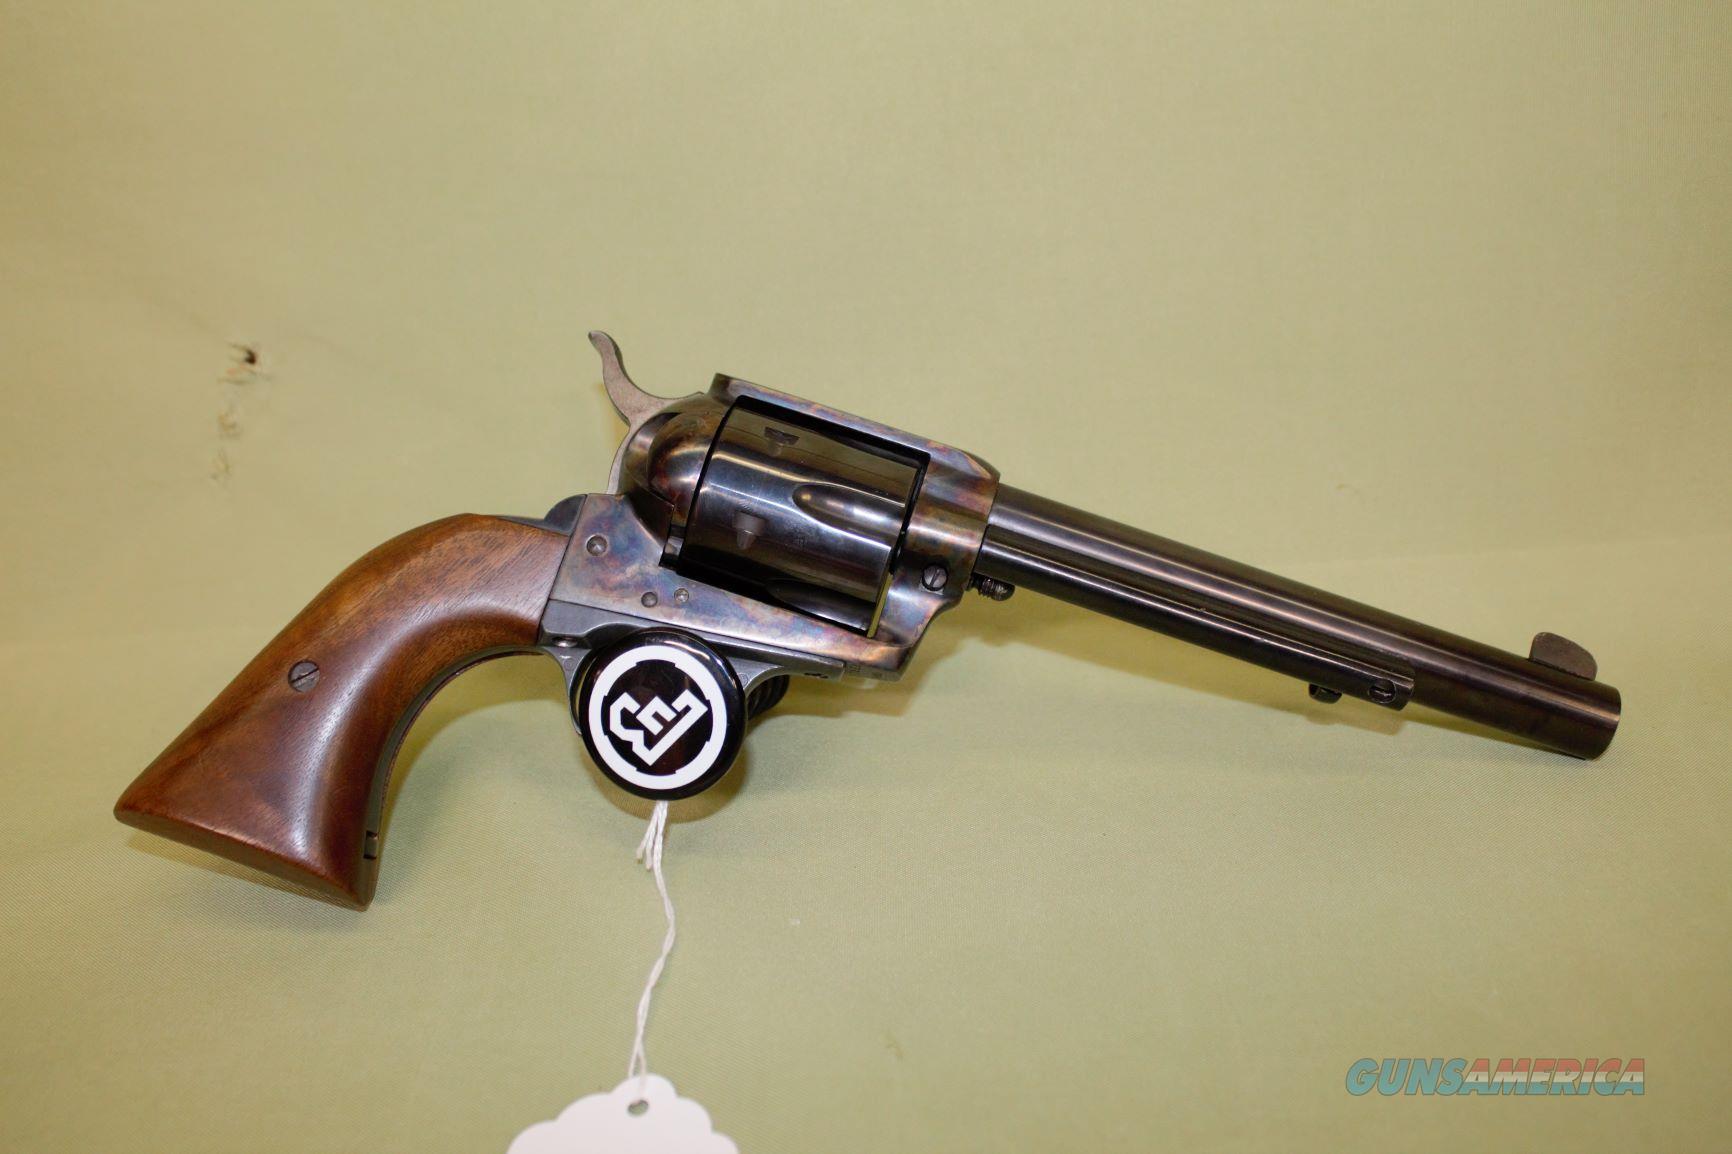 EAA Bounty Hunter 44 Magnum  Guns > Pistols > EAA Pistols > Cowboy